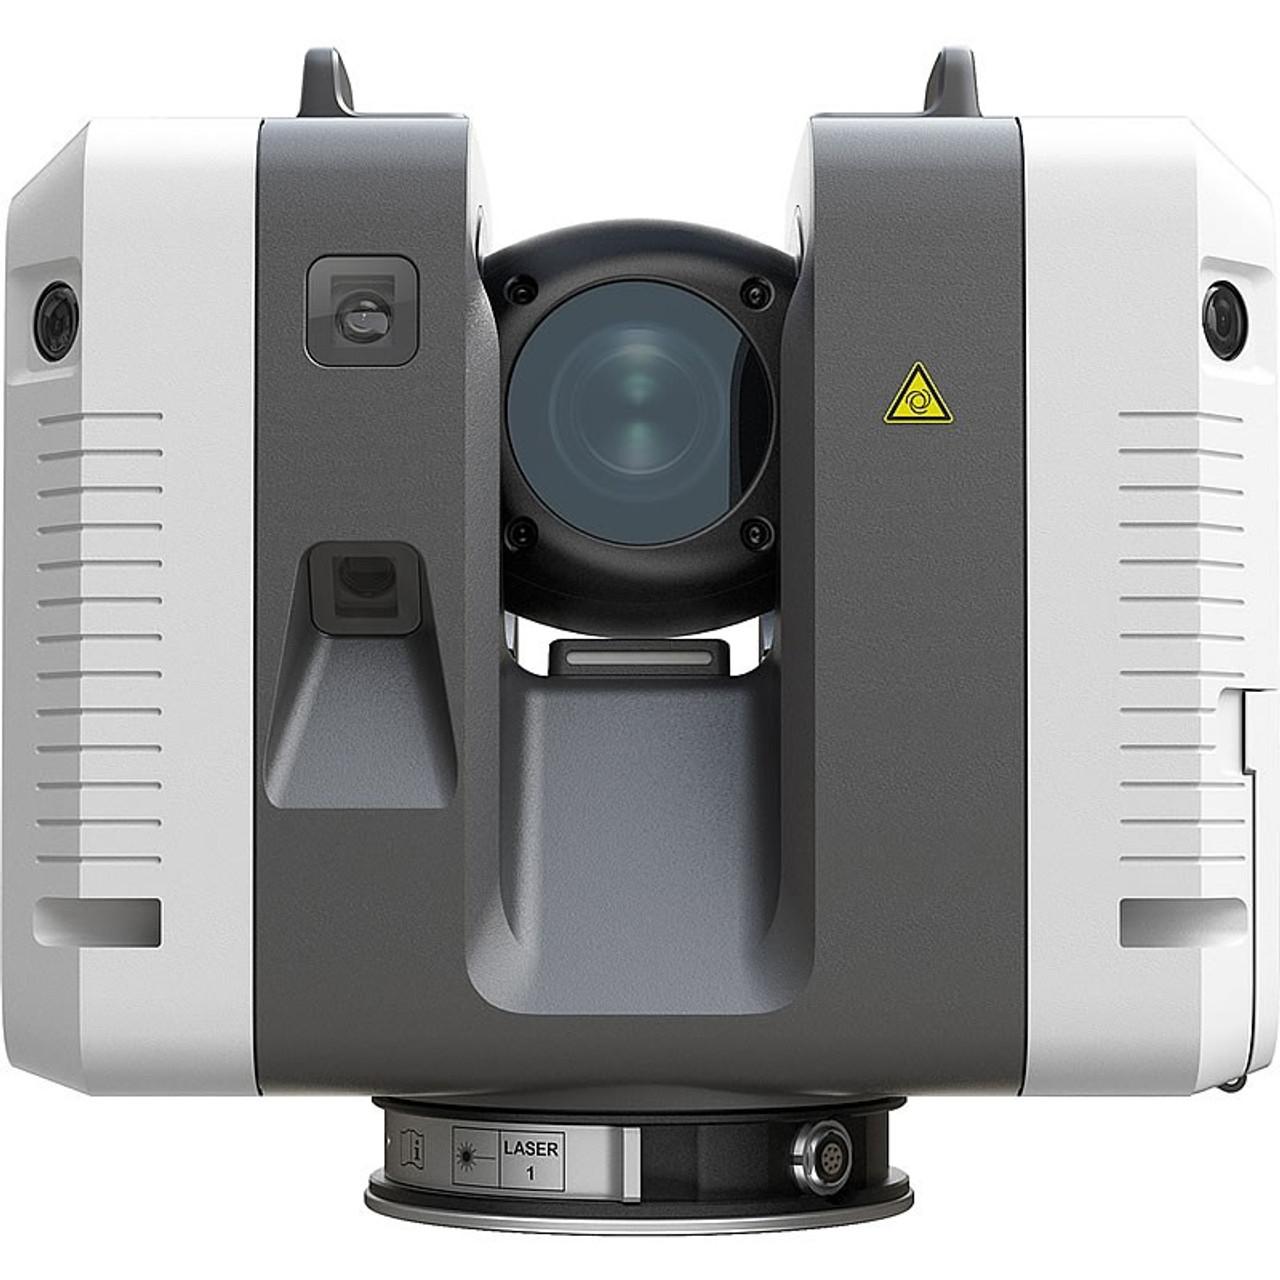 Leica RTC360 Laser Scanner Kit Lease 1,492 36 per mo